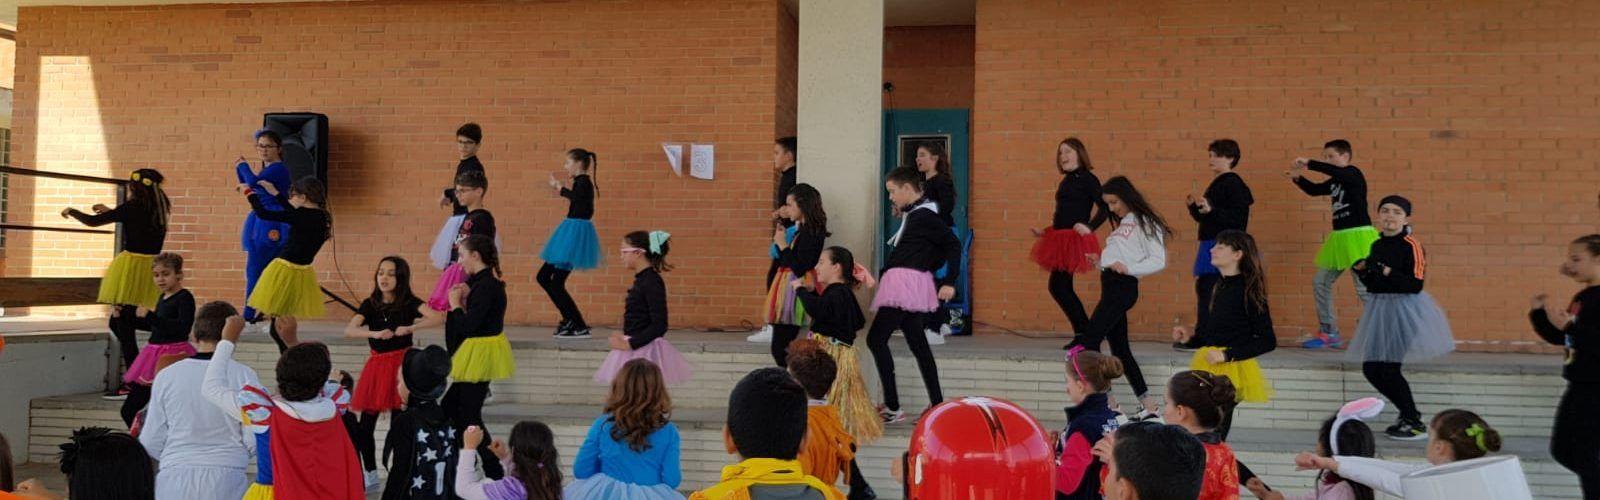 Carnaval al CEIP Sant Sebastià de Vinaròs